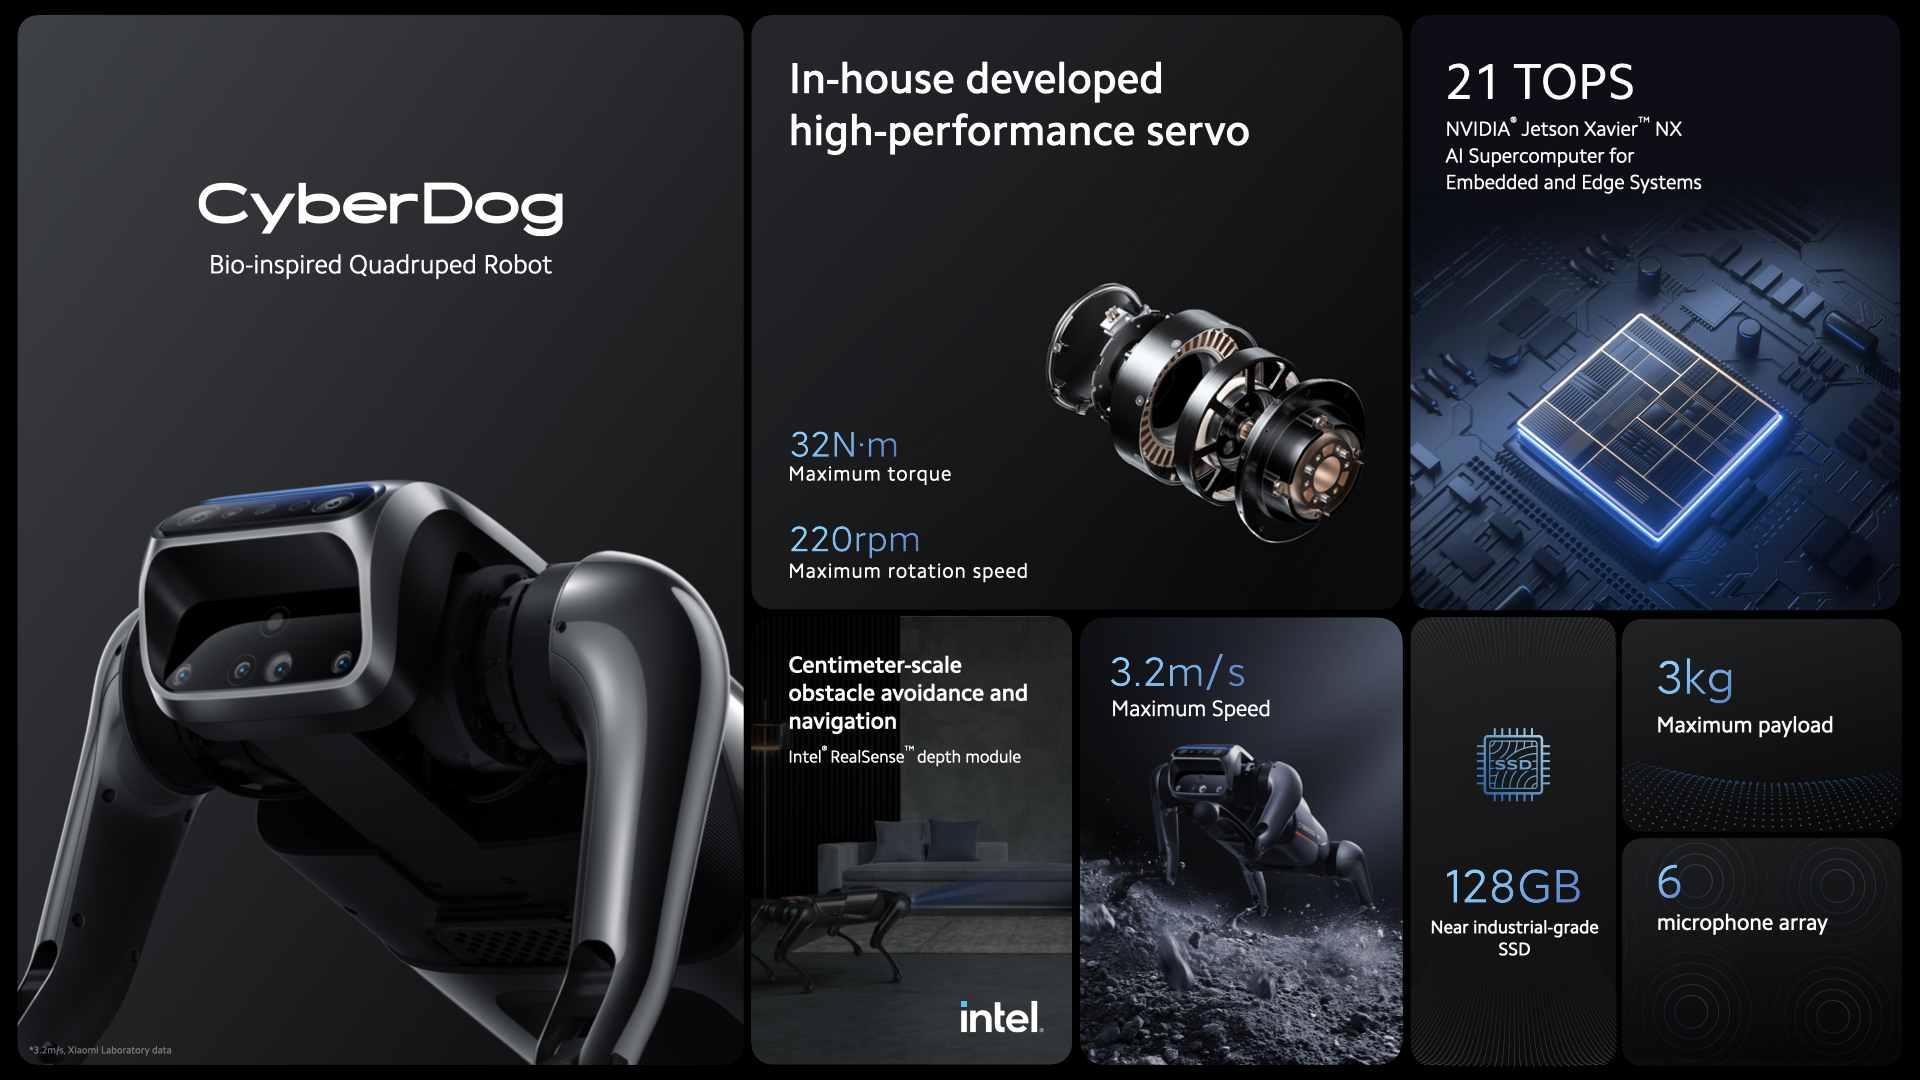 CyberDog info